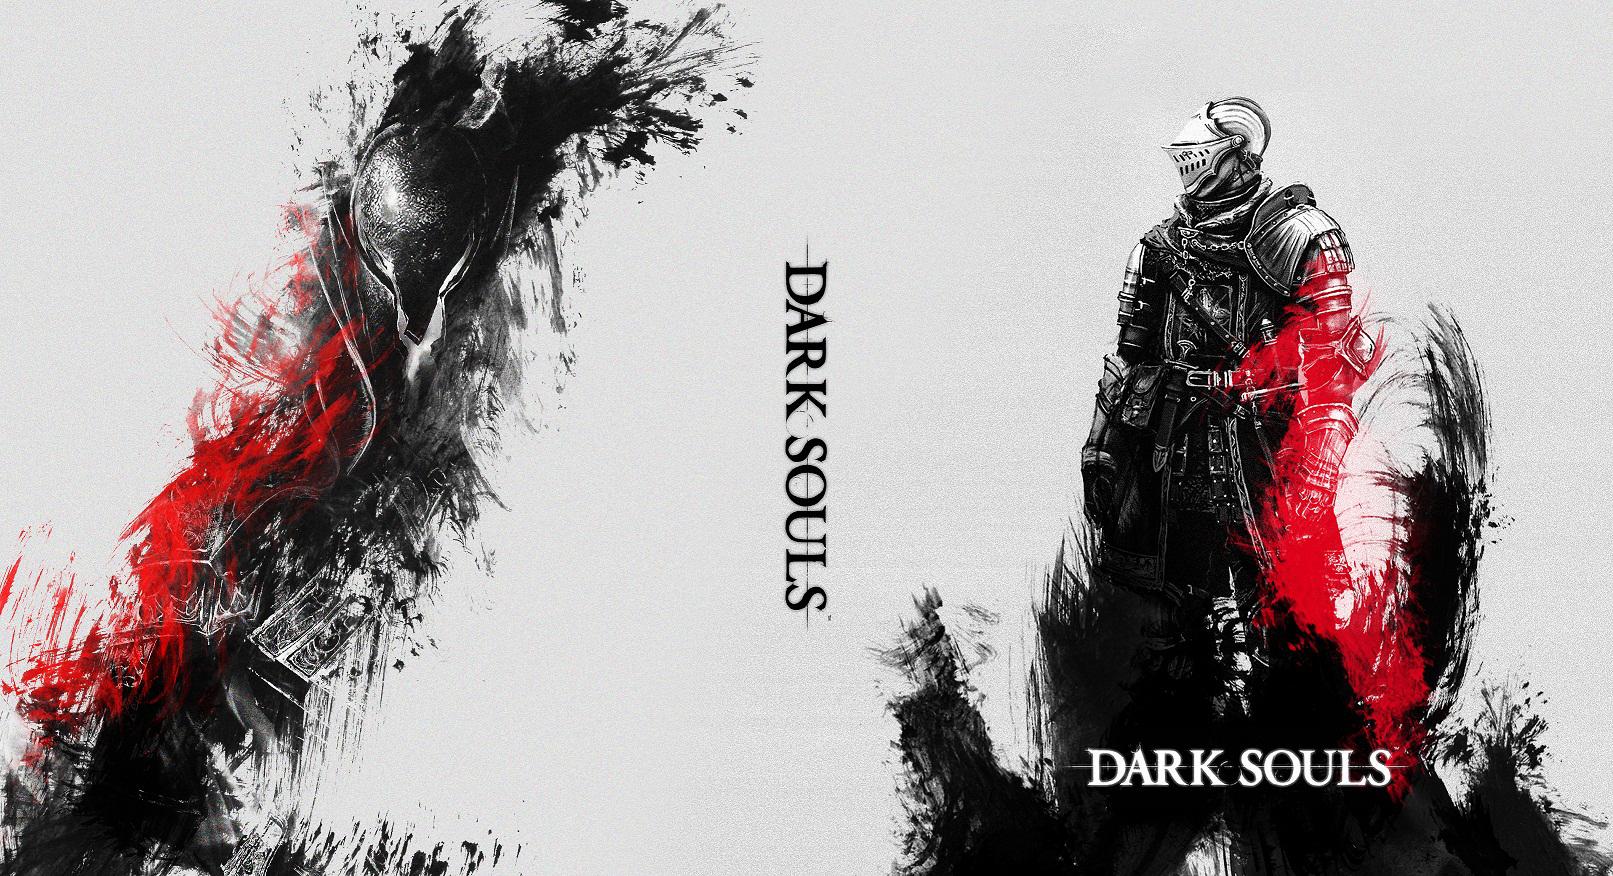 Dark Souls 2 Wallpaper Hd: 229 Dark Souls HD Wallpapers